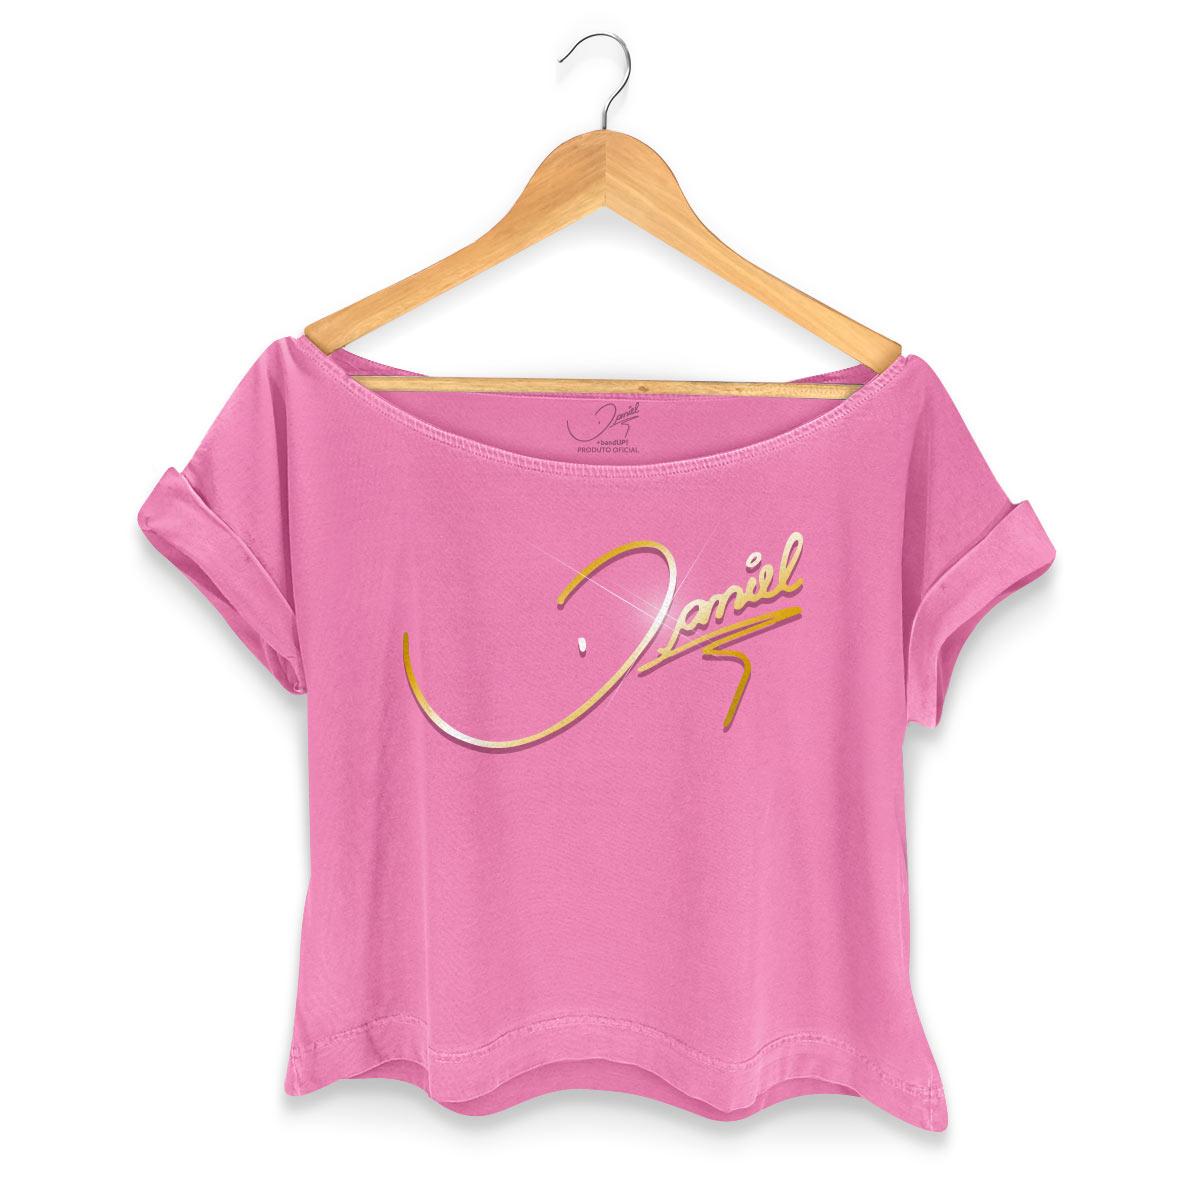 T-shirt Premium Feminina Daniel Logo Gold